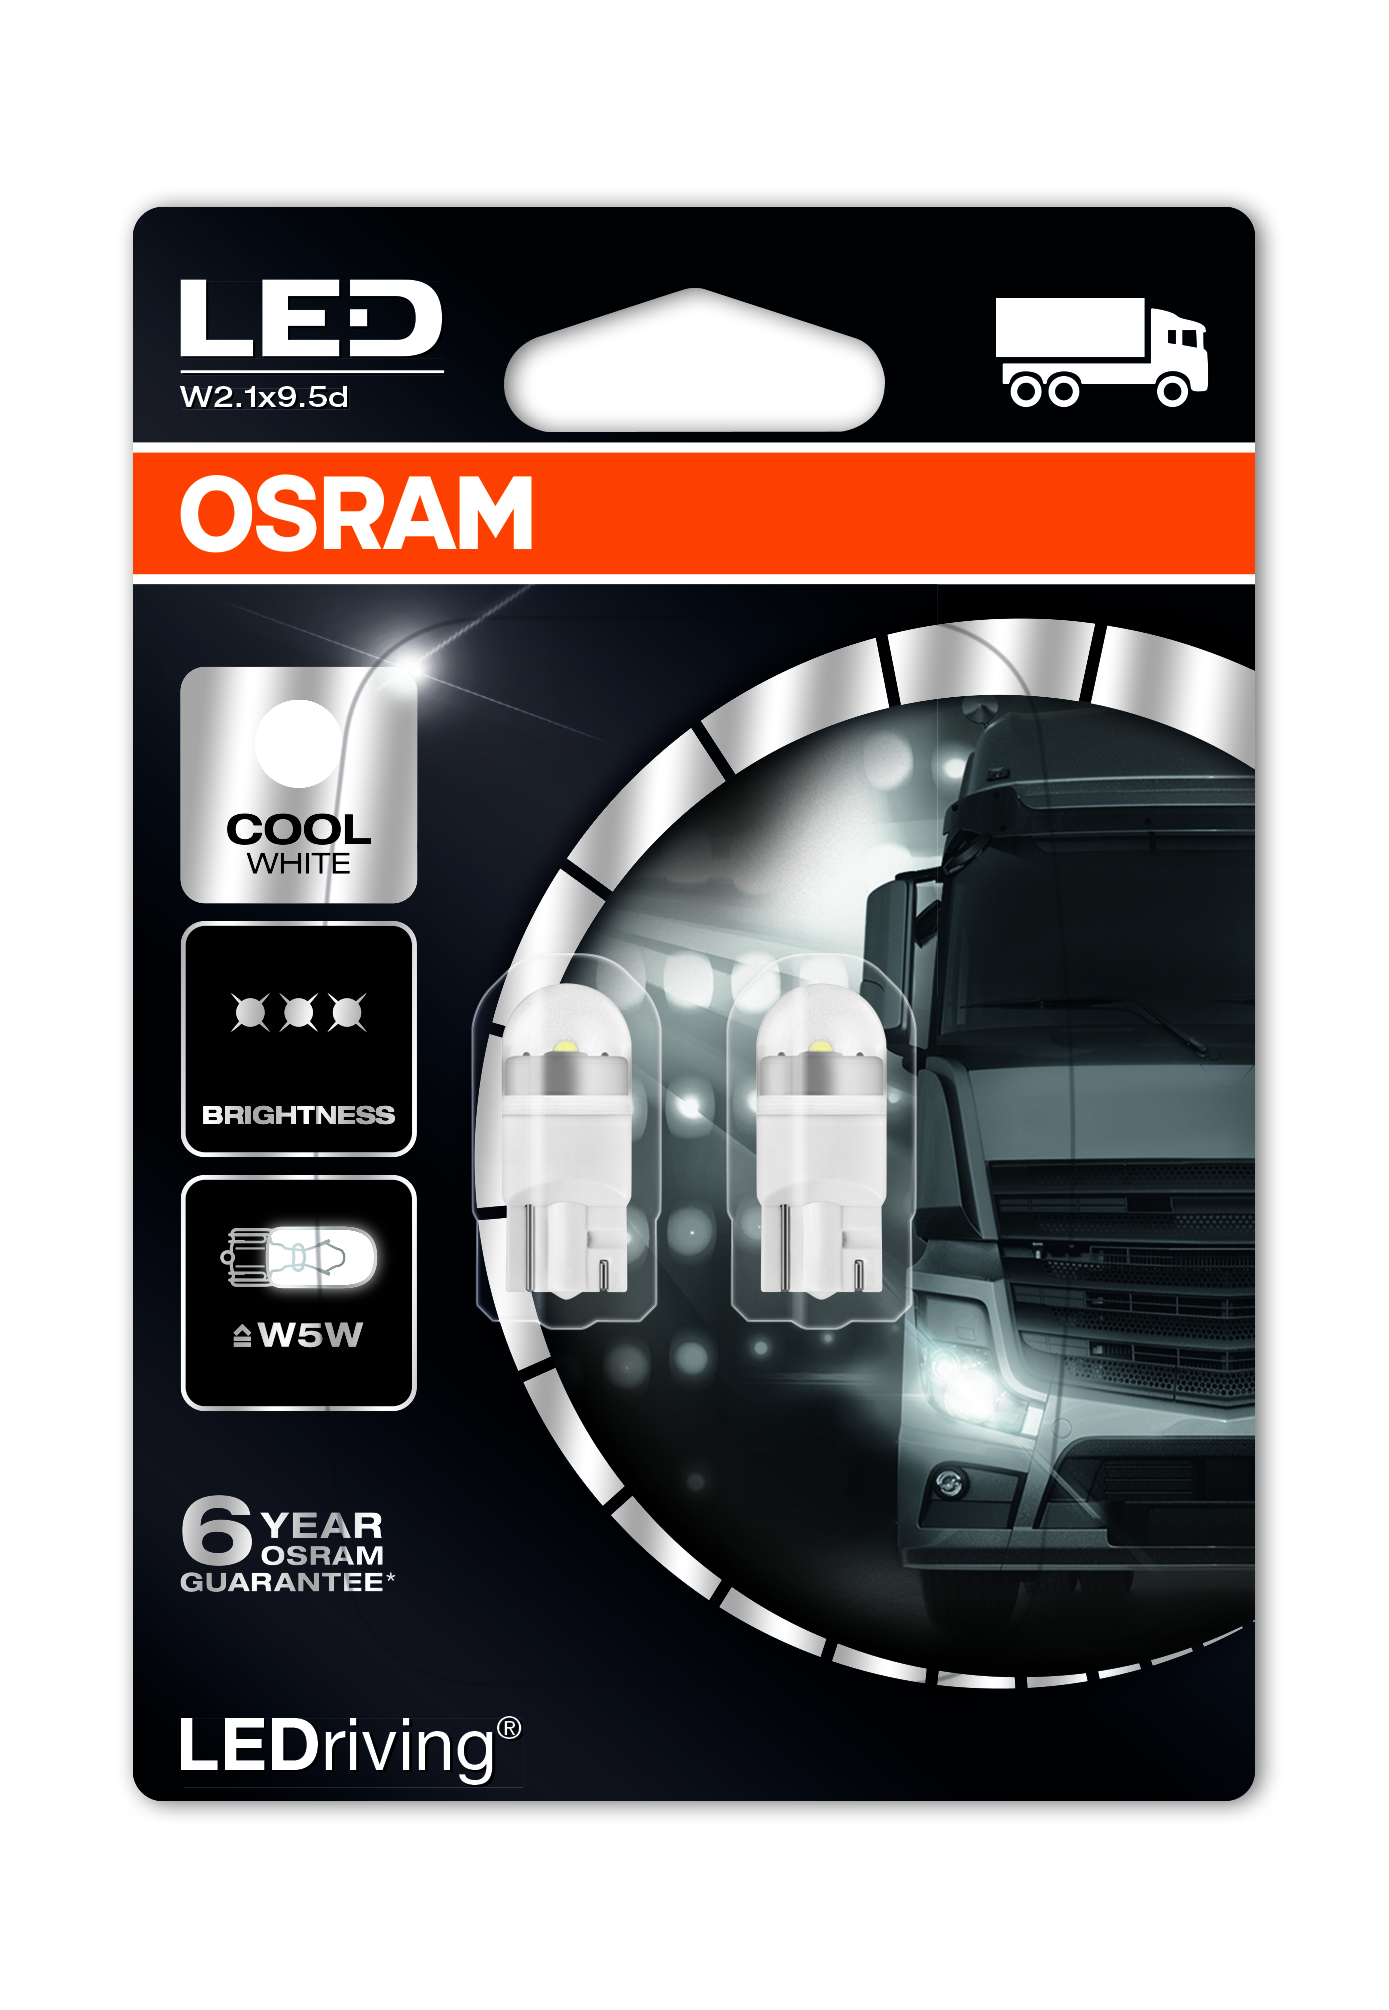 Osram LED, LEDriving Premium, W5W, W2,1x9,5d, 24V, 1W, 2824CW 6000K